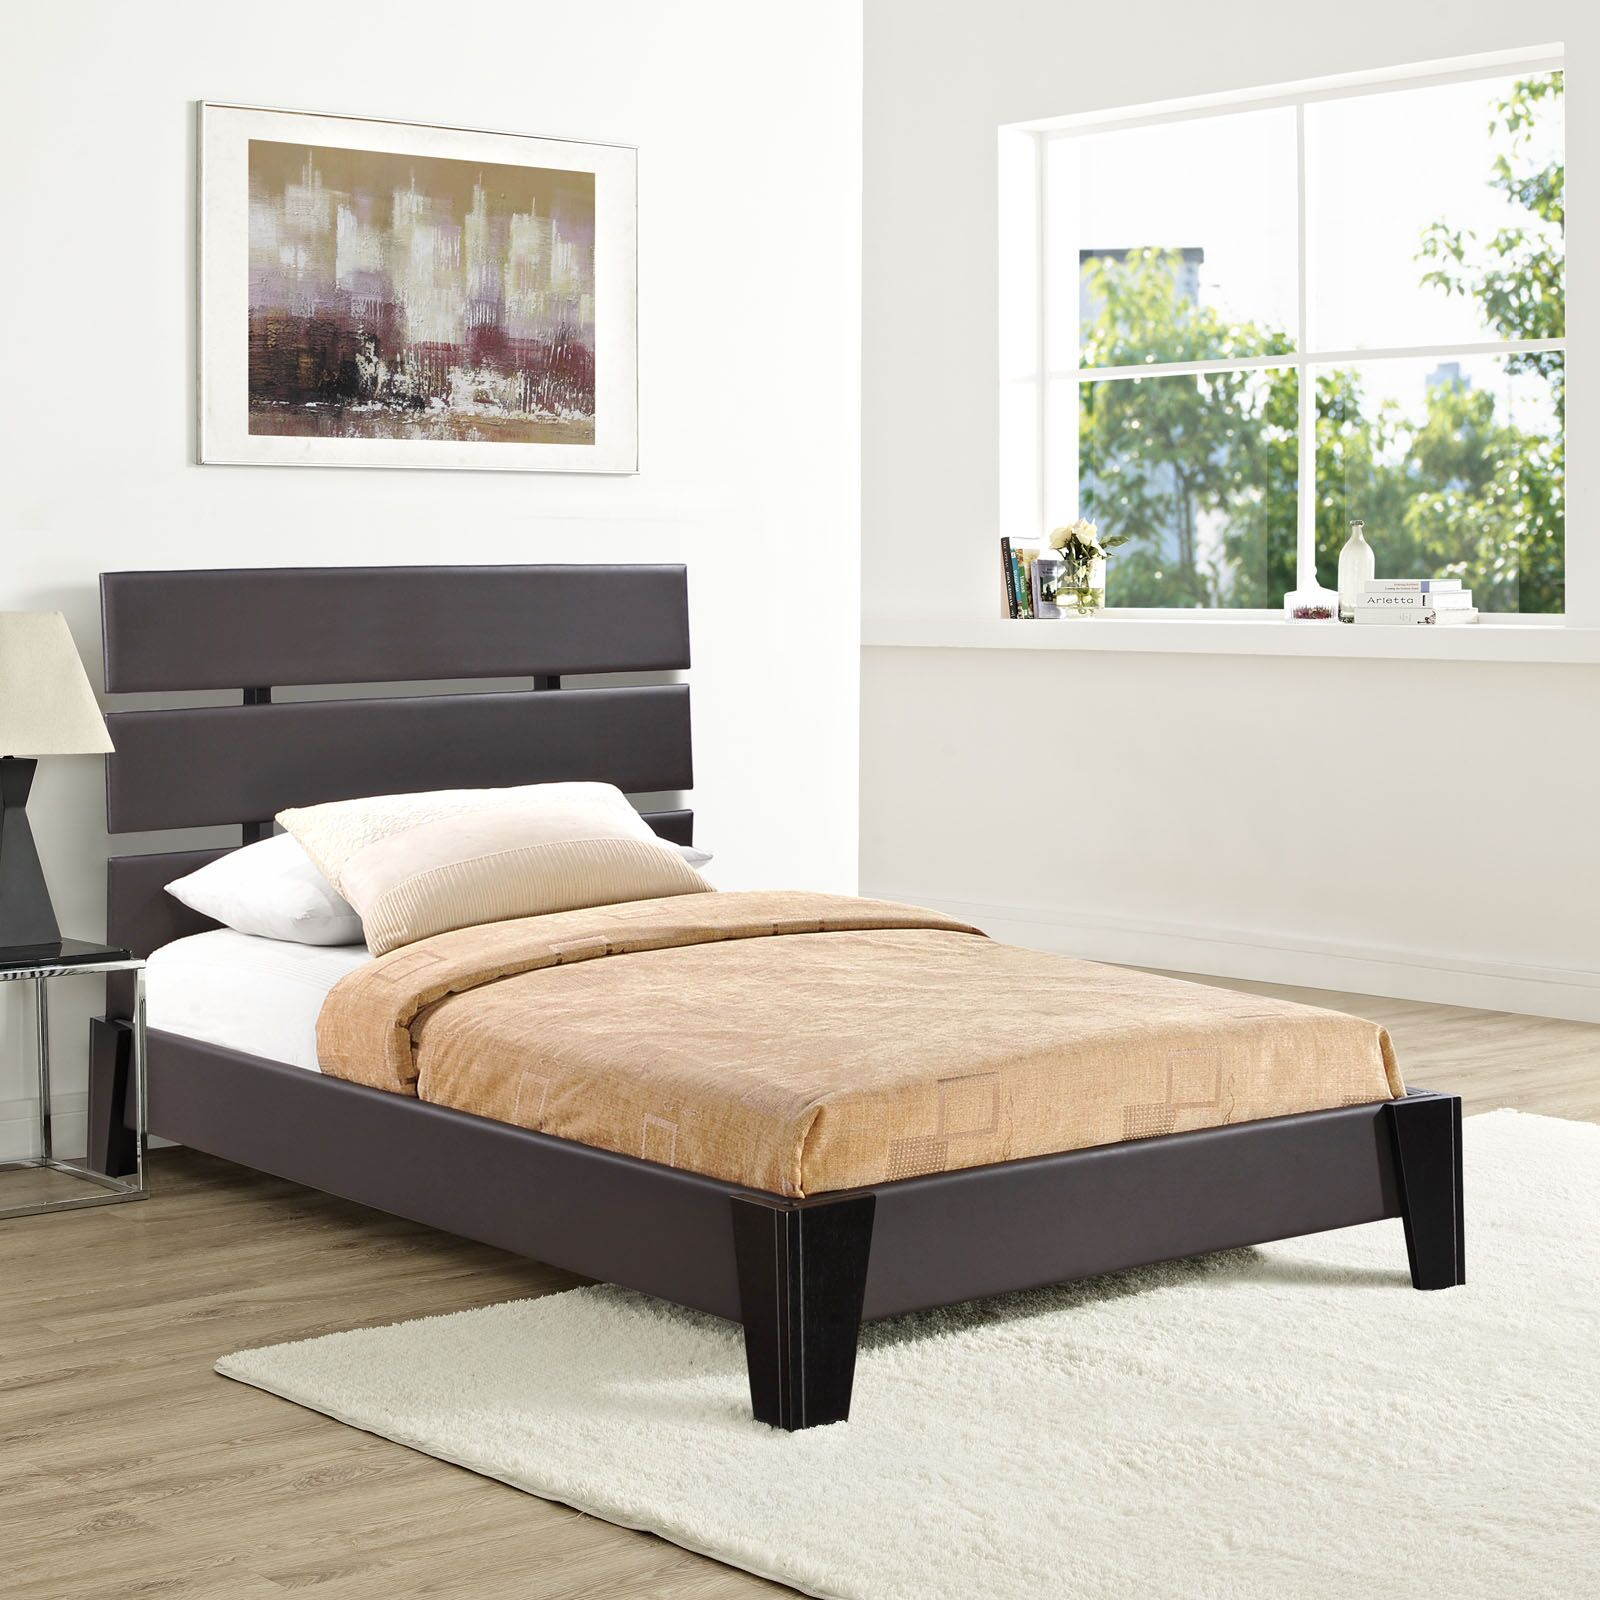 Zoe Upholstered Platform Bed Color: Brown, Size: Twin